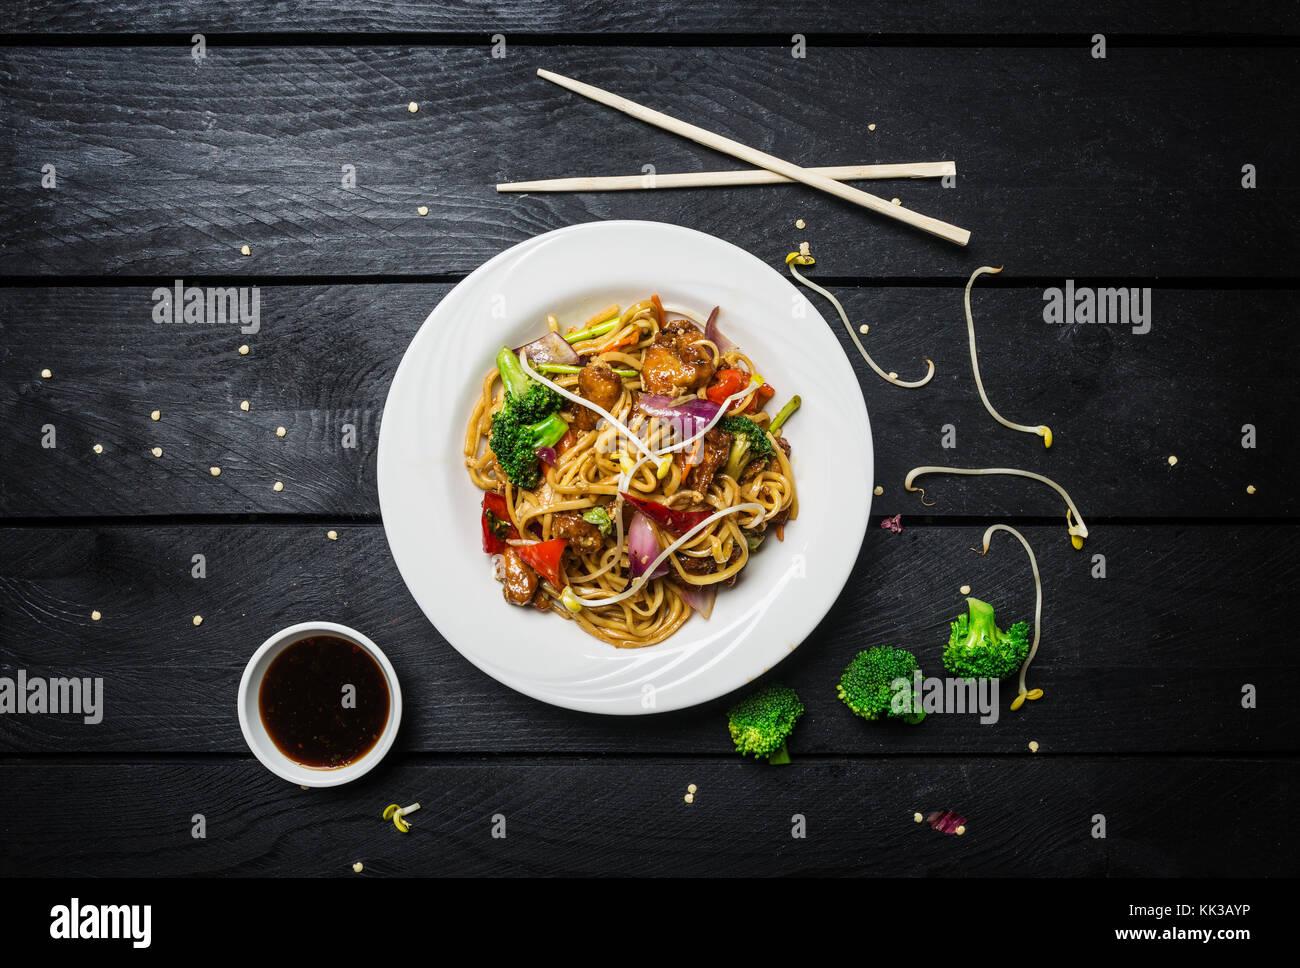 Wok Plate Stock Photos Amp Wok Plate Stock Images Alamy